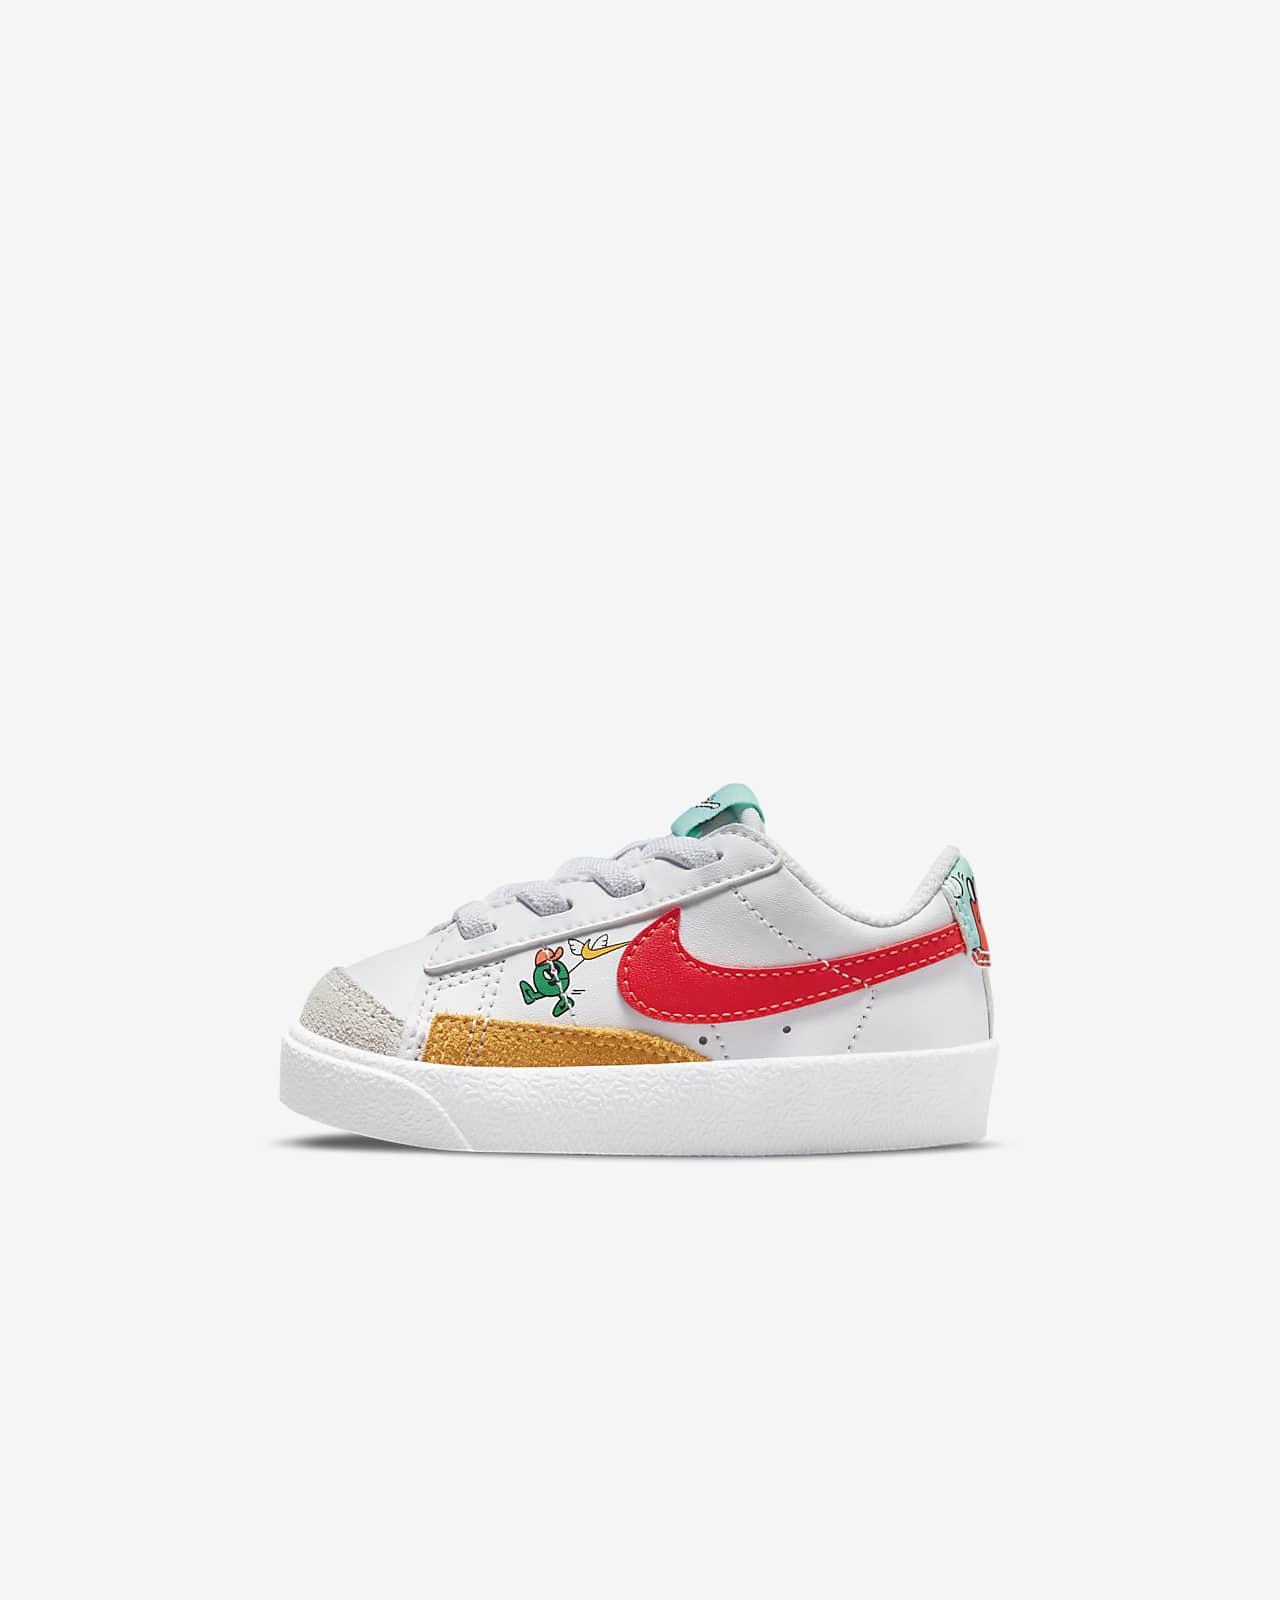 Nike Blazer Low '77 BT 婴童运动童鞋